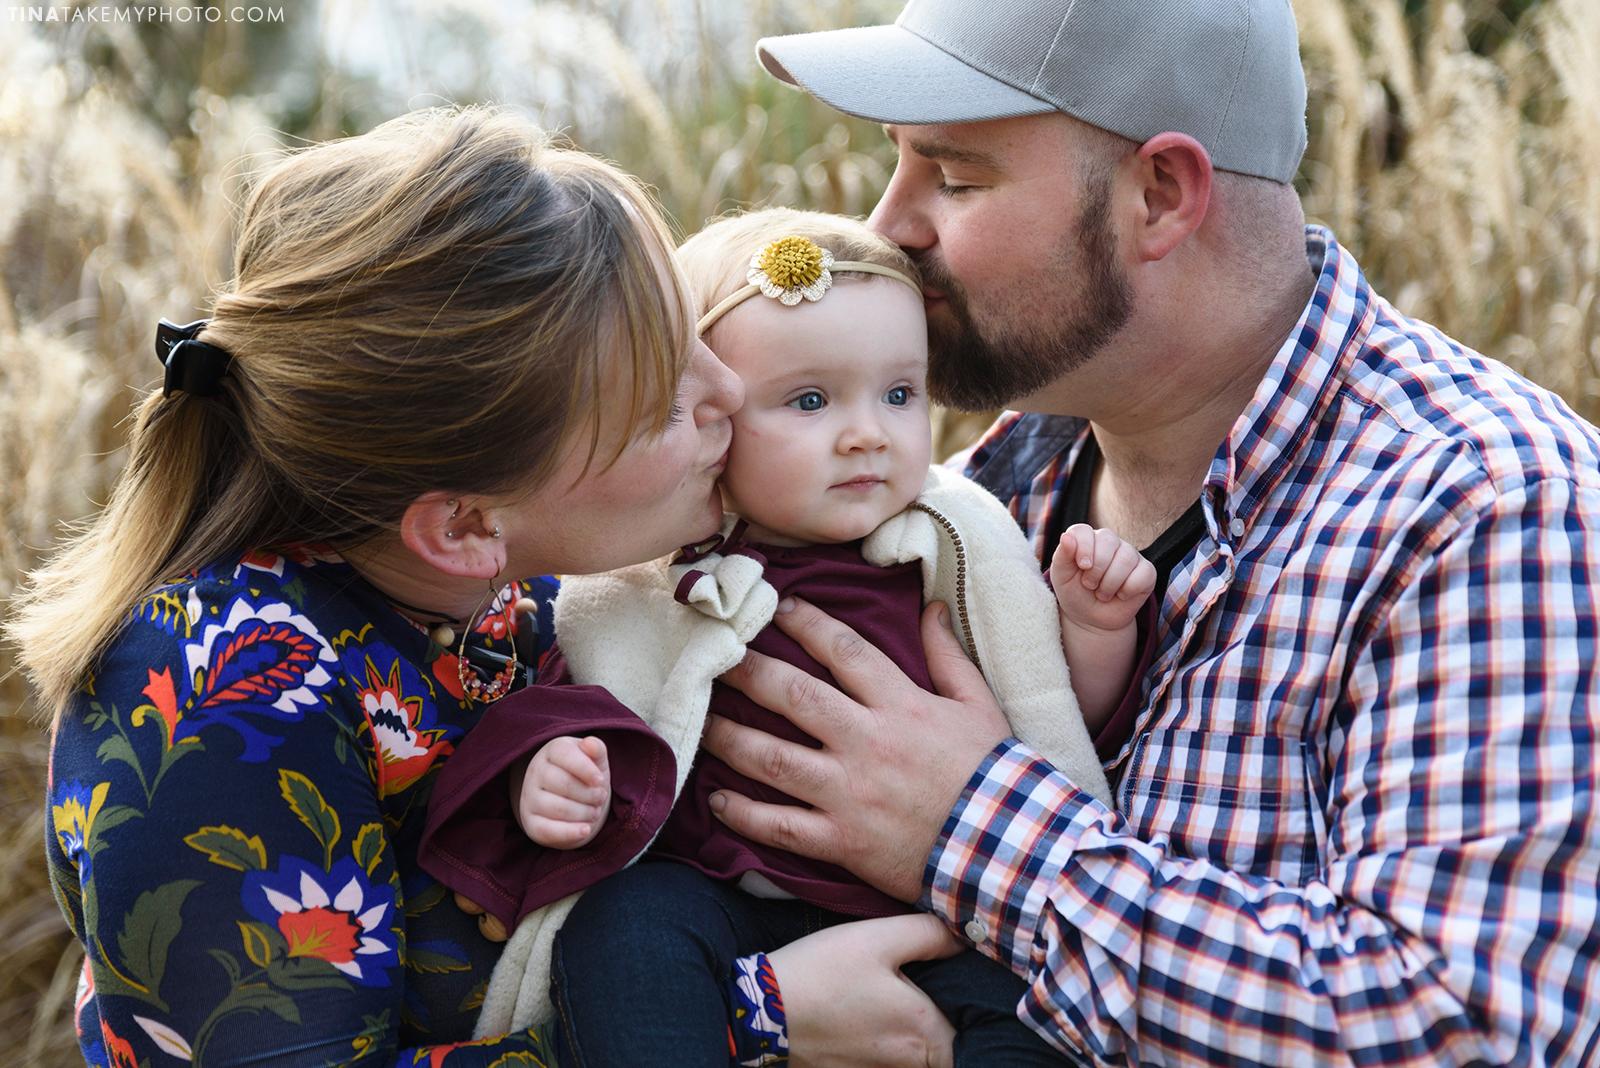 rockwood park winter family photography rva